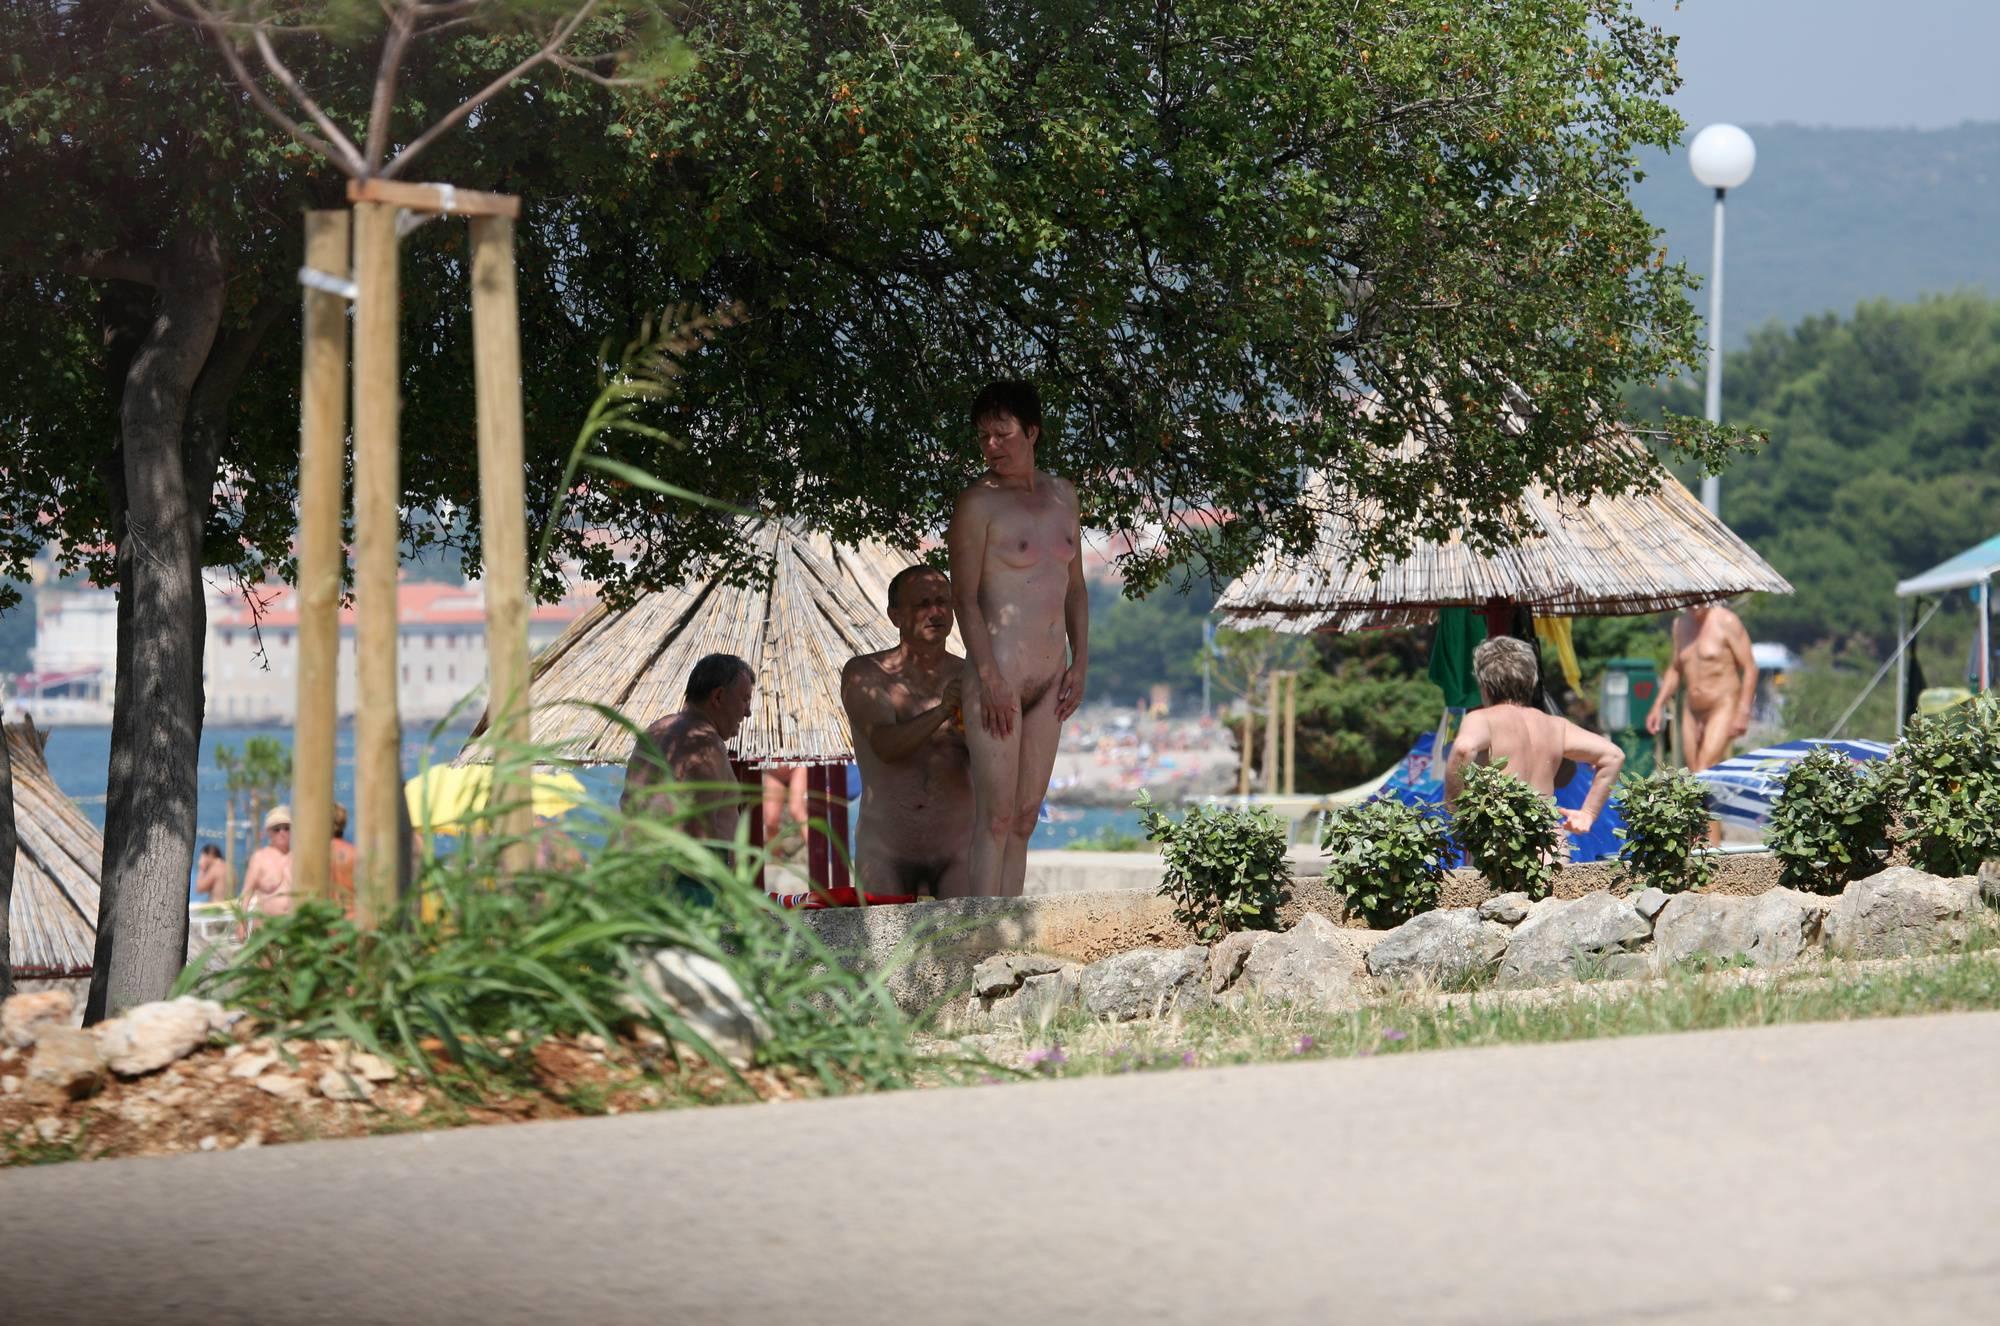 Bondi Beach-Park Grounds - 1